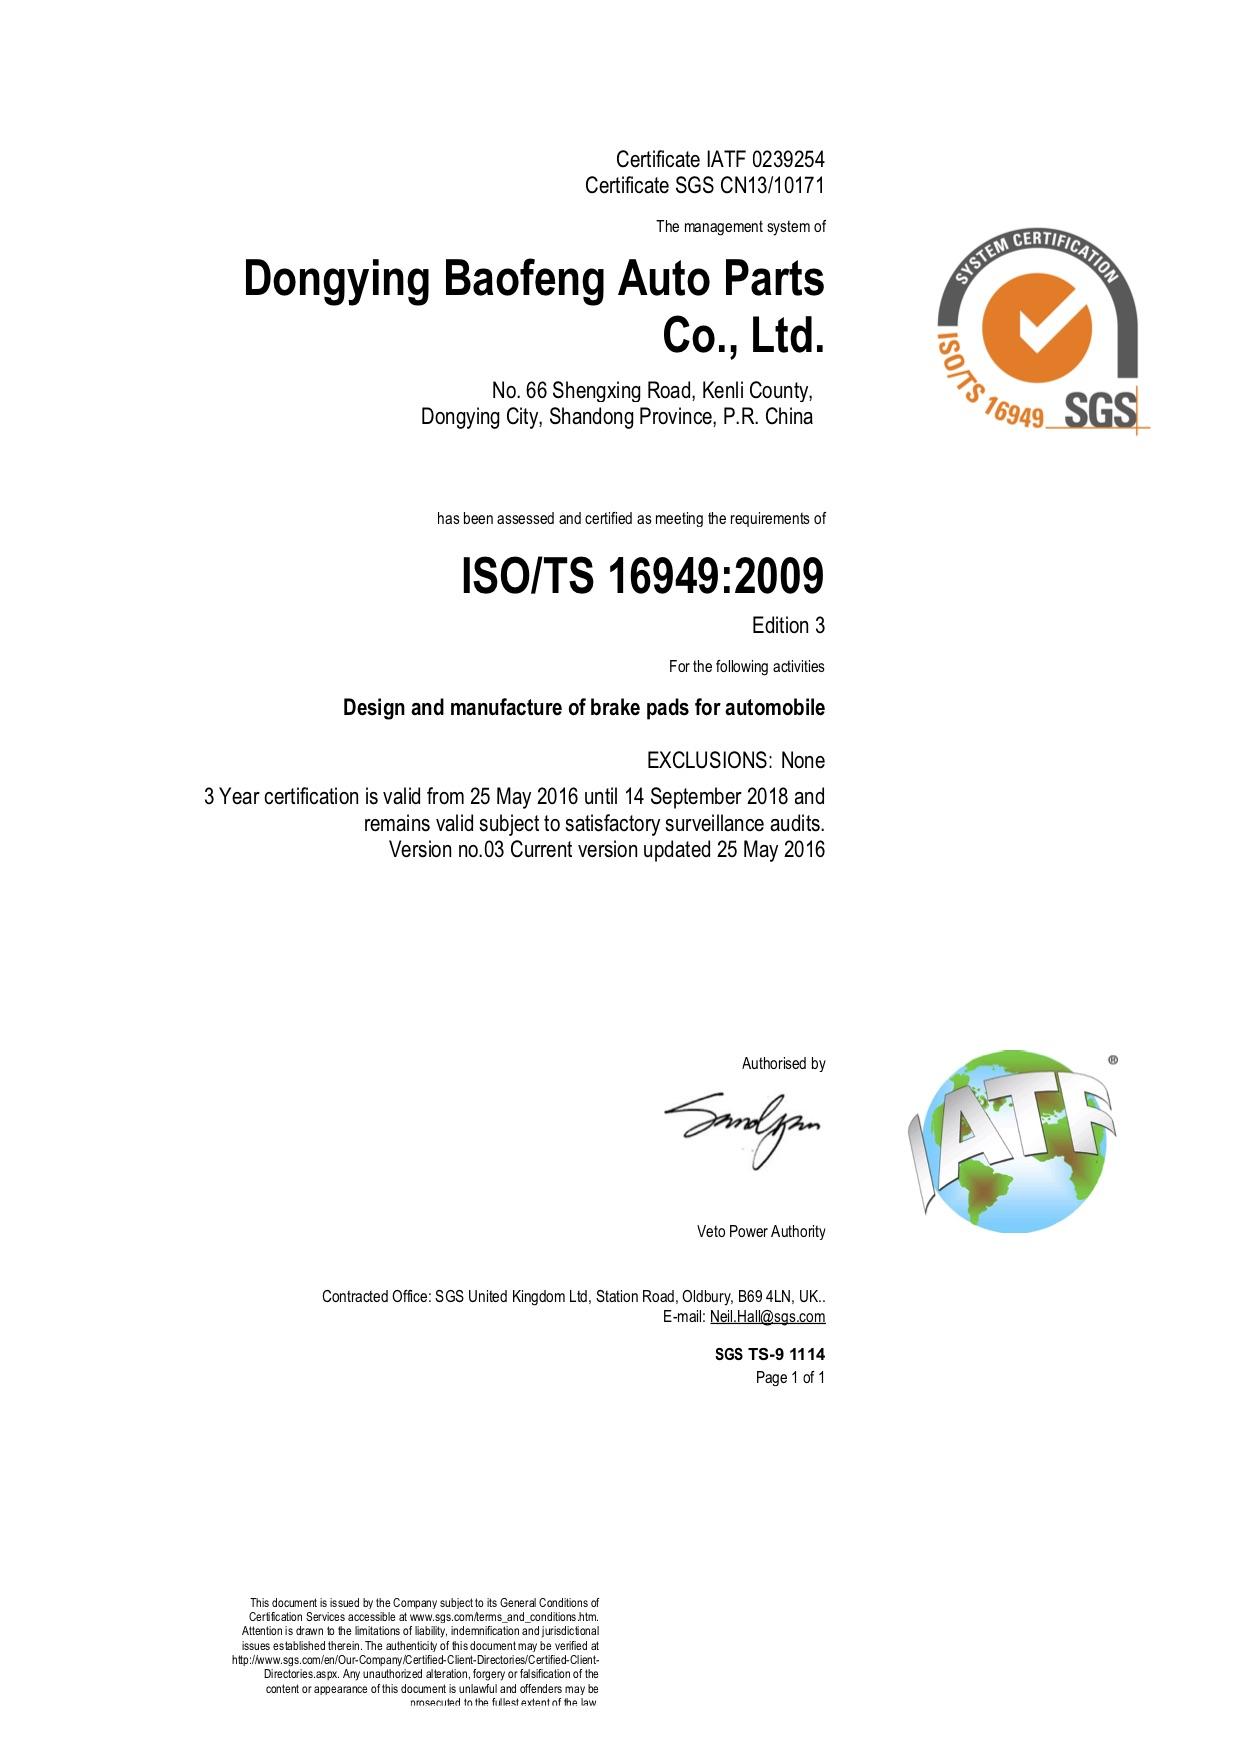 ISO/TS 16949:2009 Certificate